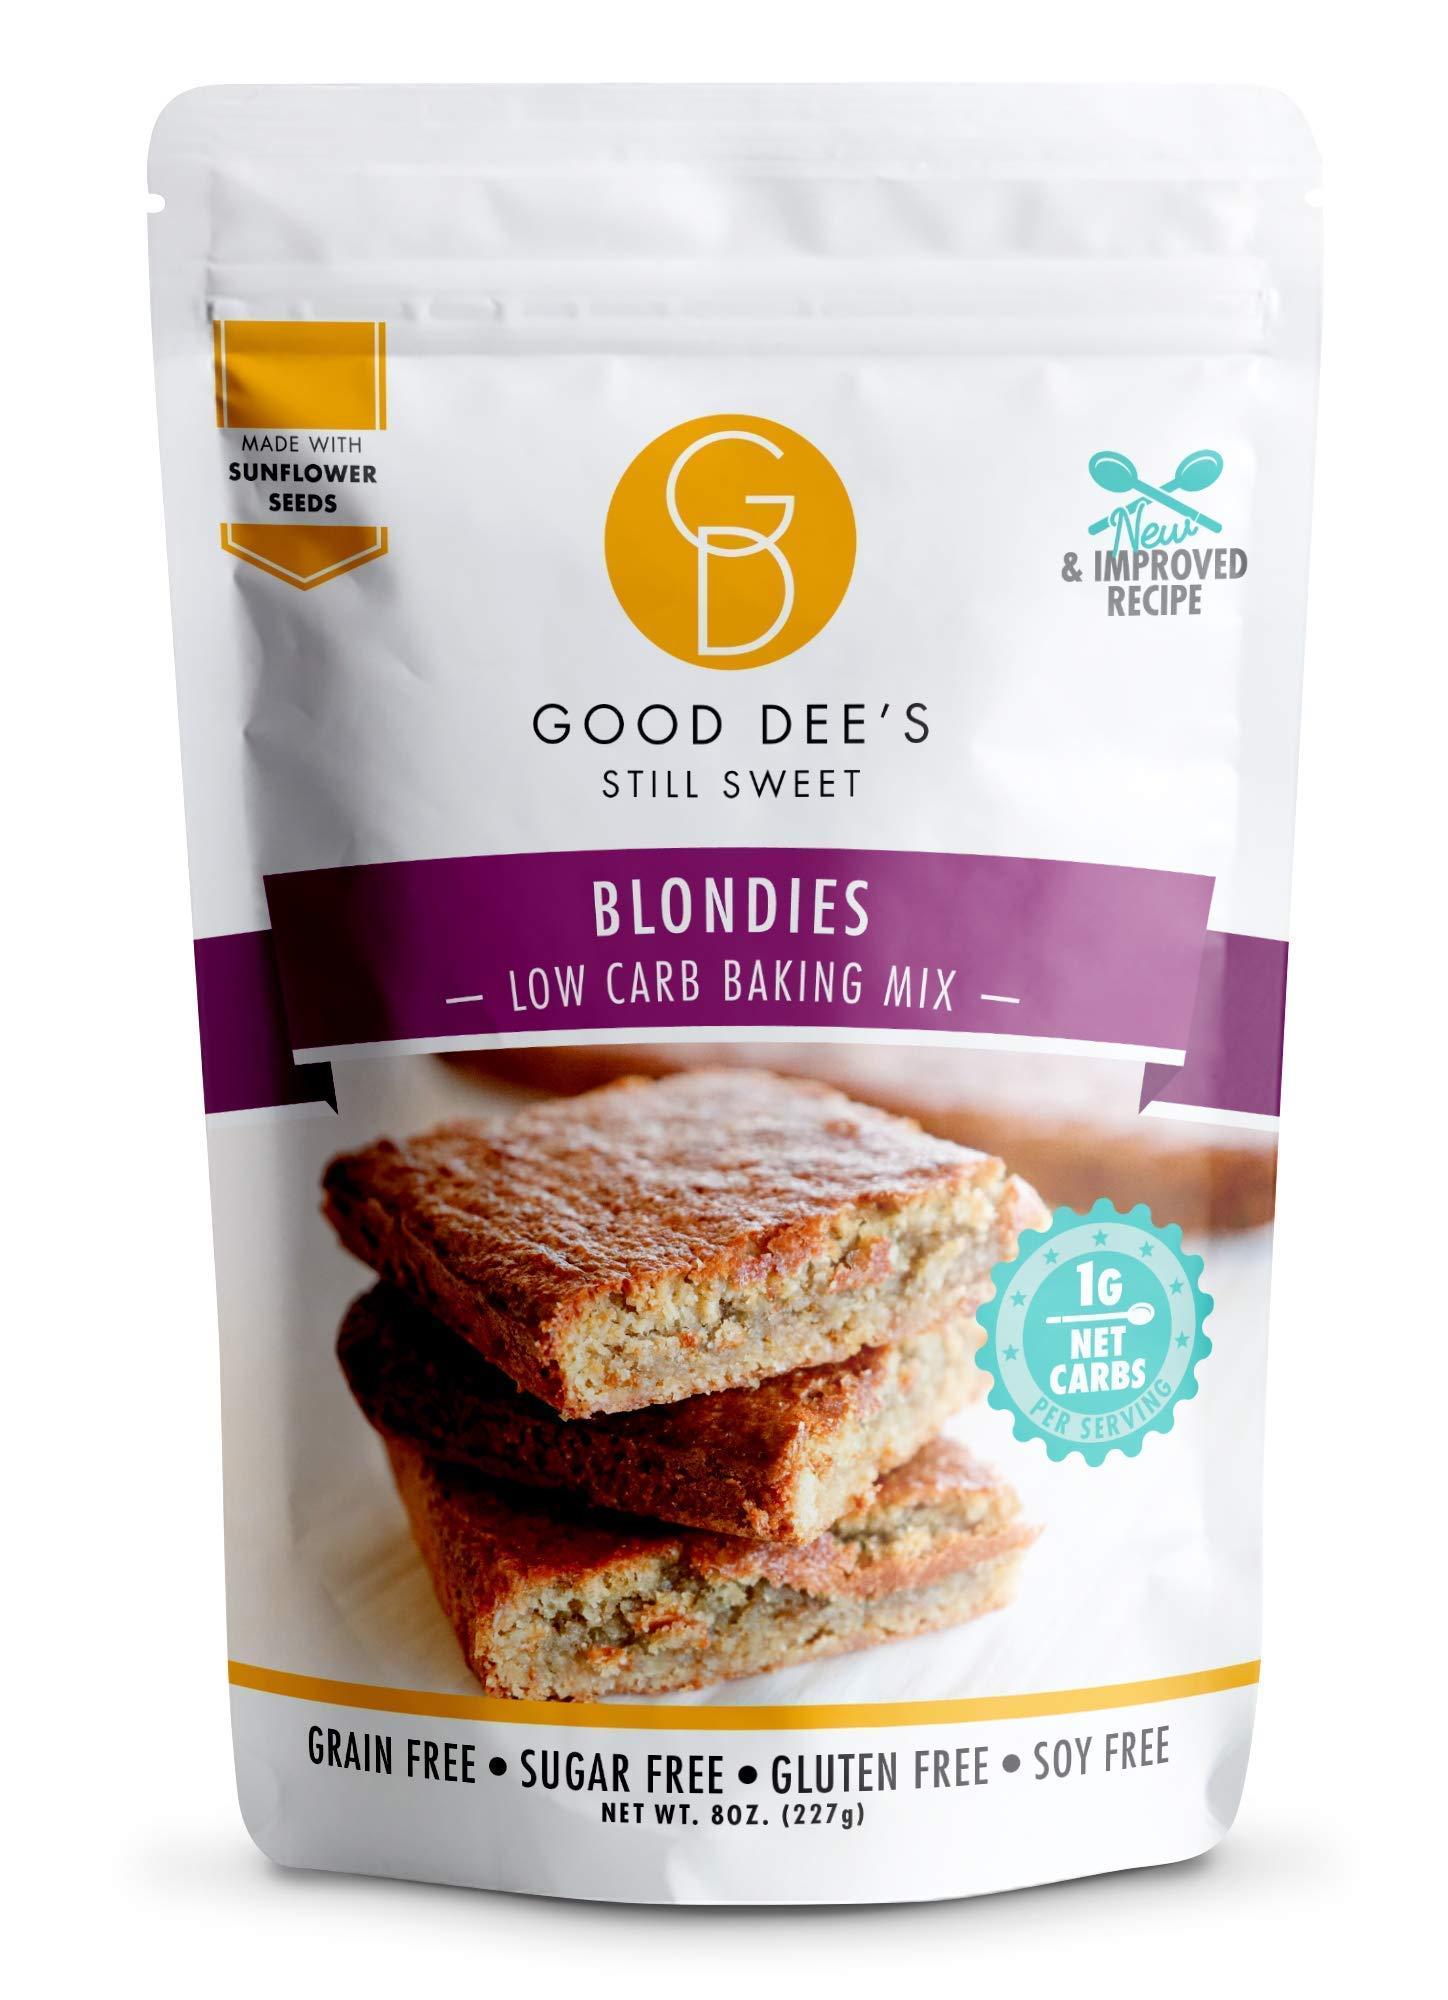 Good Dee's Blondie Brownie Mix - Low Carb Keto Baking Mix (1g Net Carbs, 12 Servings) | Sugar-Free, Gluten-Free, Grain-Free, Nut-Free, Soy-Free & IMO-Free | Diabetic, Atkins & WW Friendly